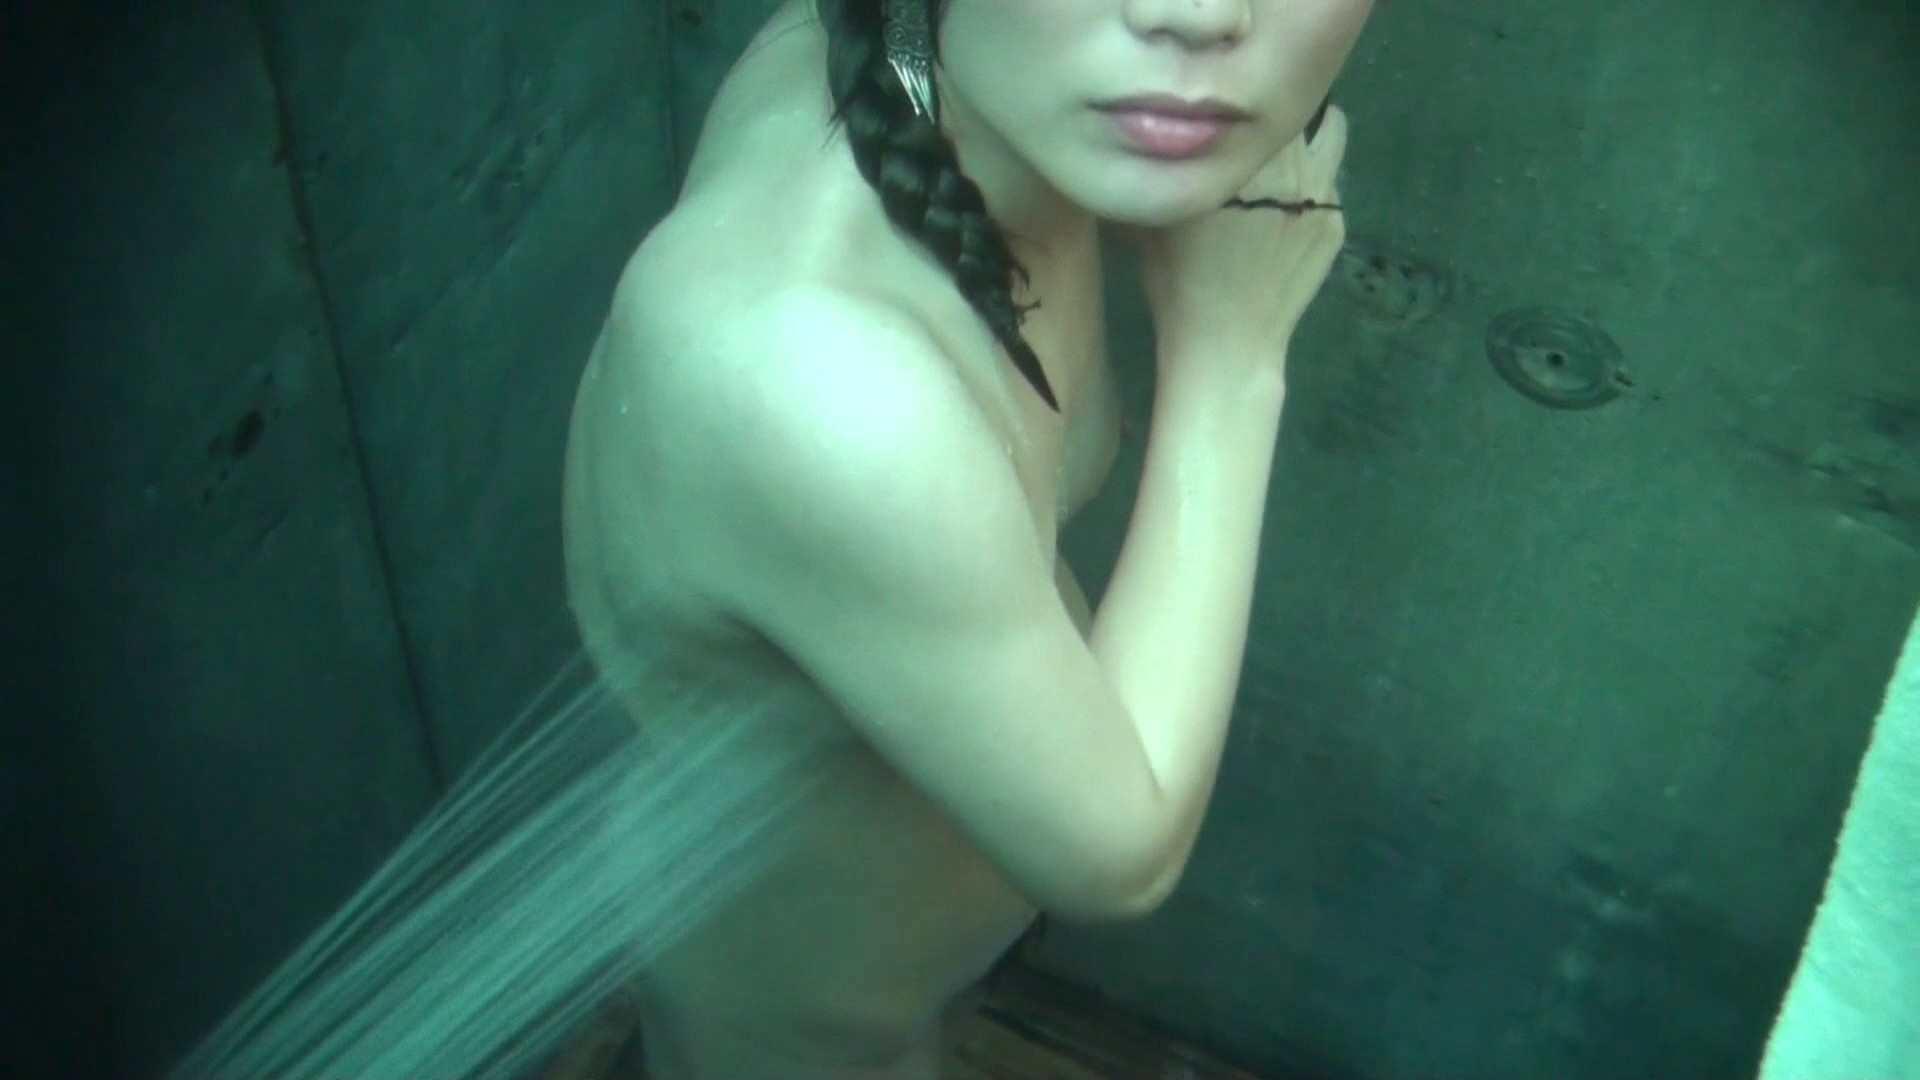 Vol.12 女性の性器には予想外の砂が混入しているようです。 シャワー中 | 高画質  96連発 47